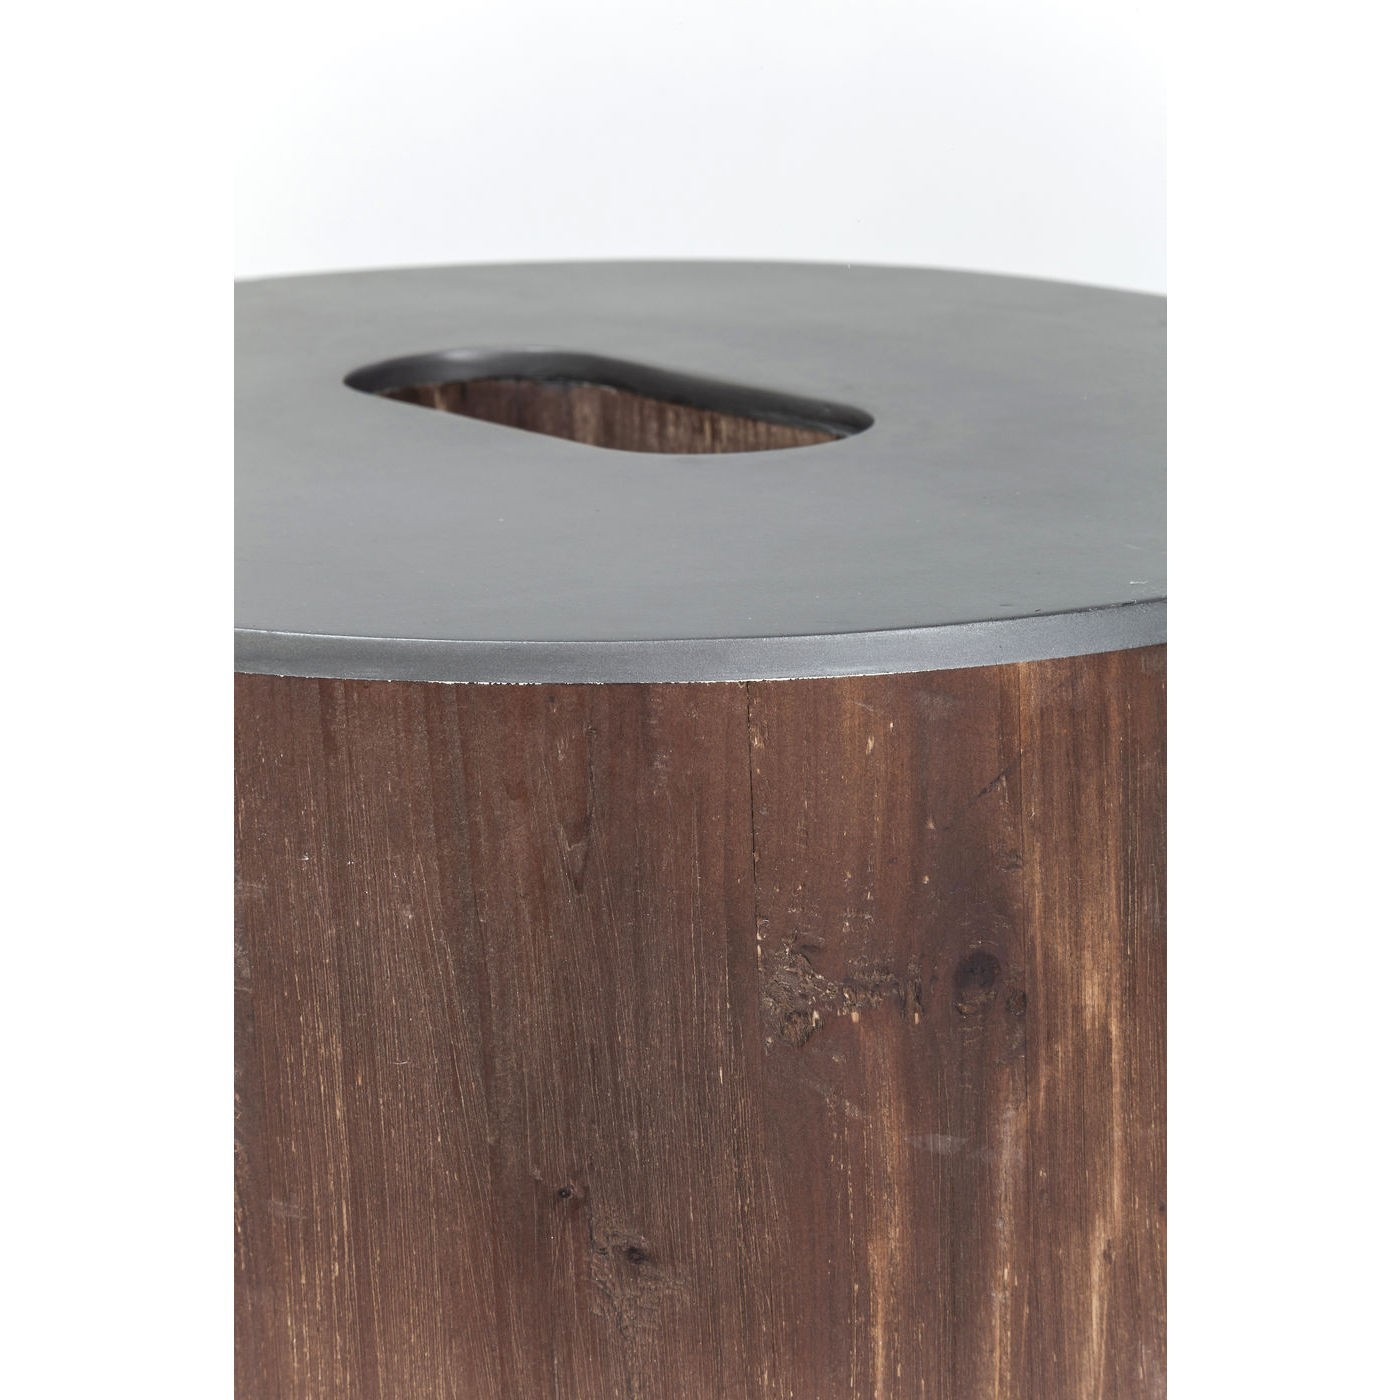 Table d'appoint Lettre O Kare Design